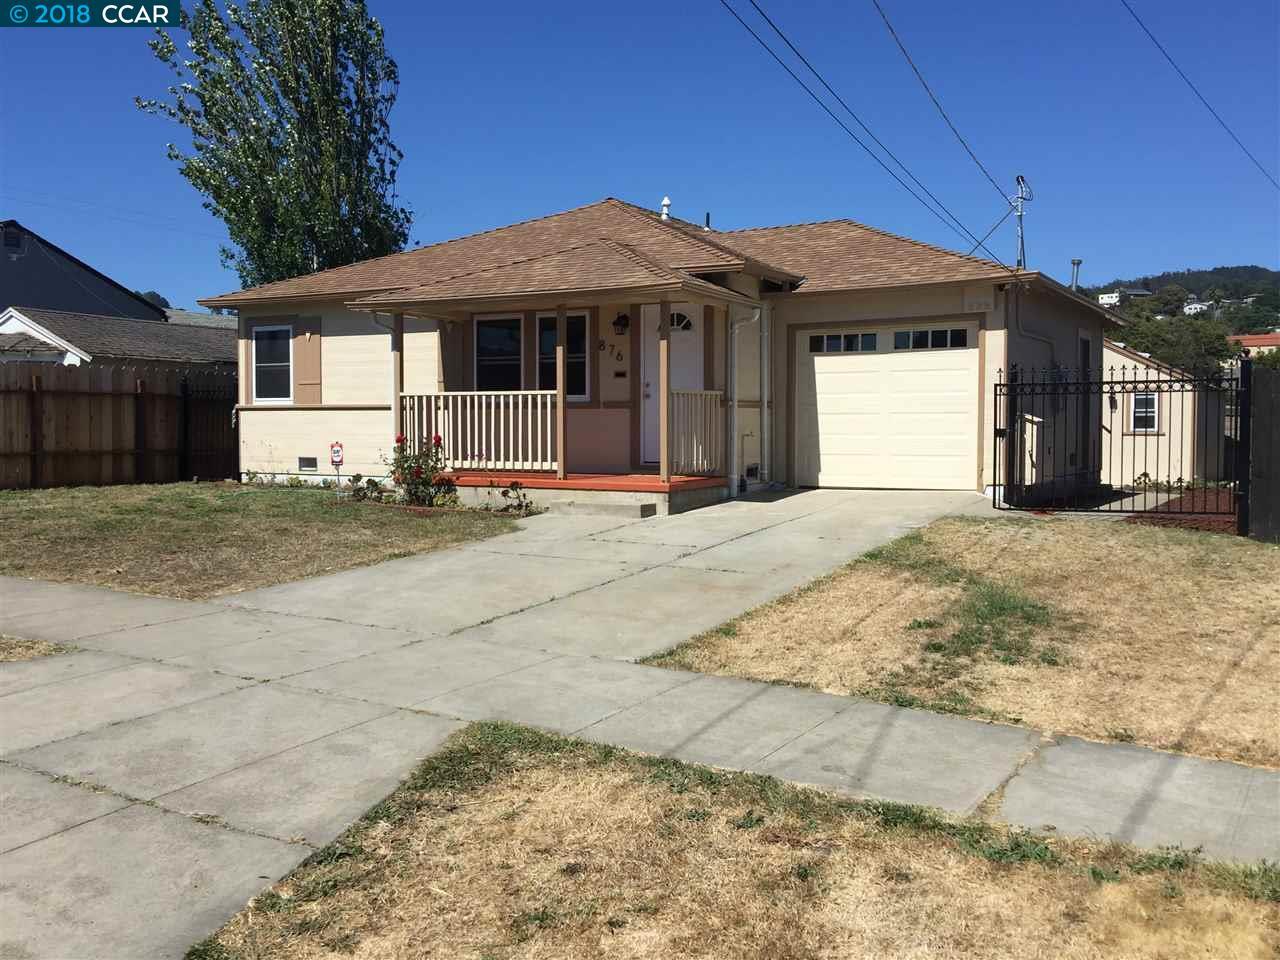 876 HUMBOLDT ST, RICHMOND, CA 94805